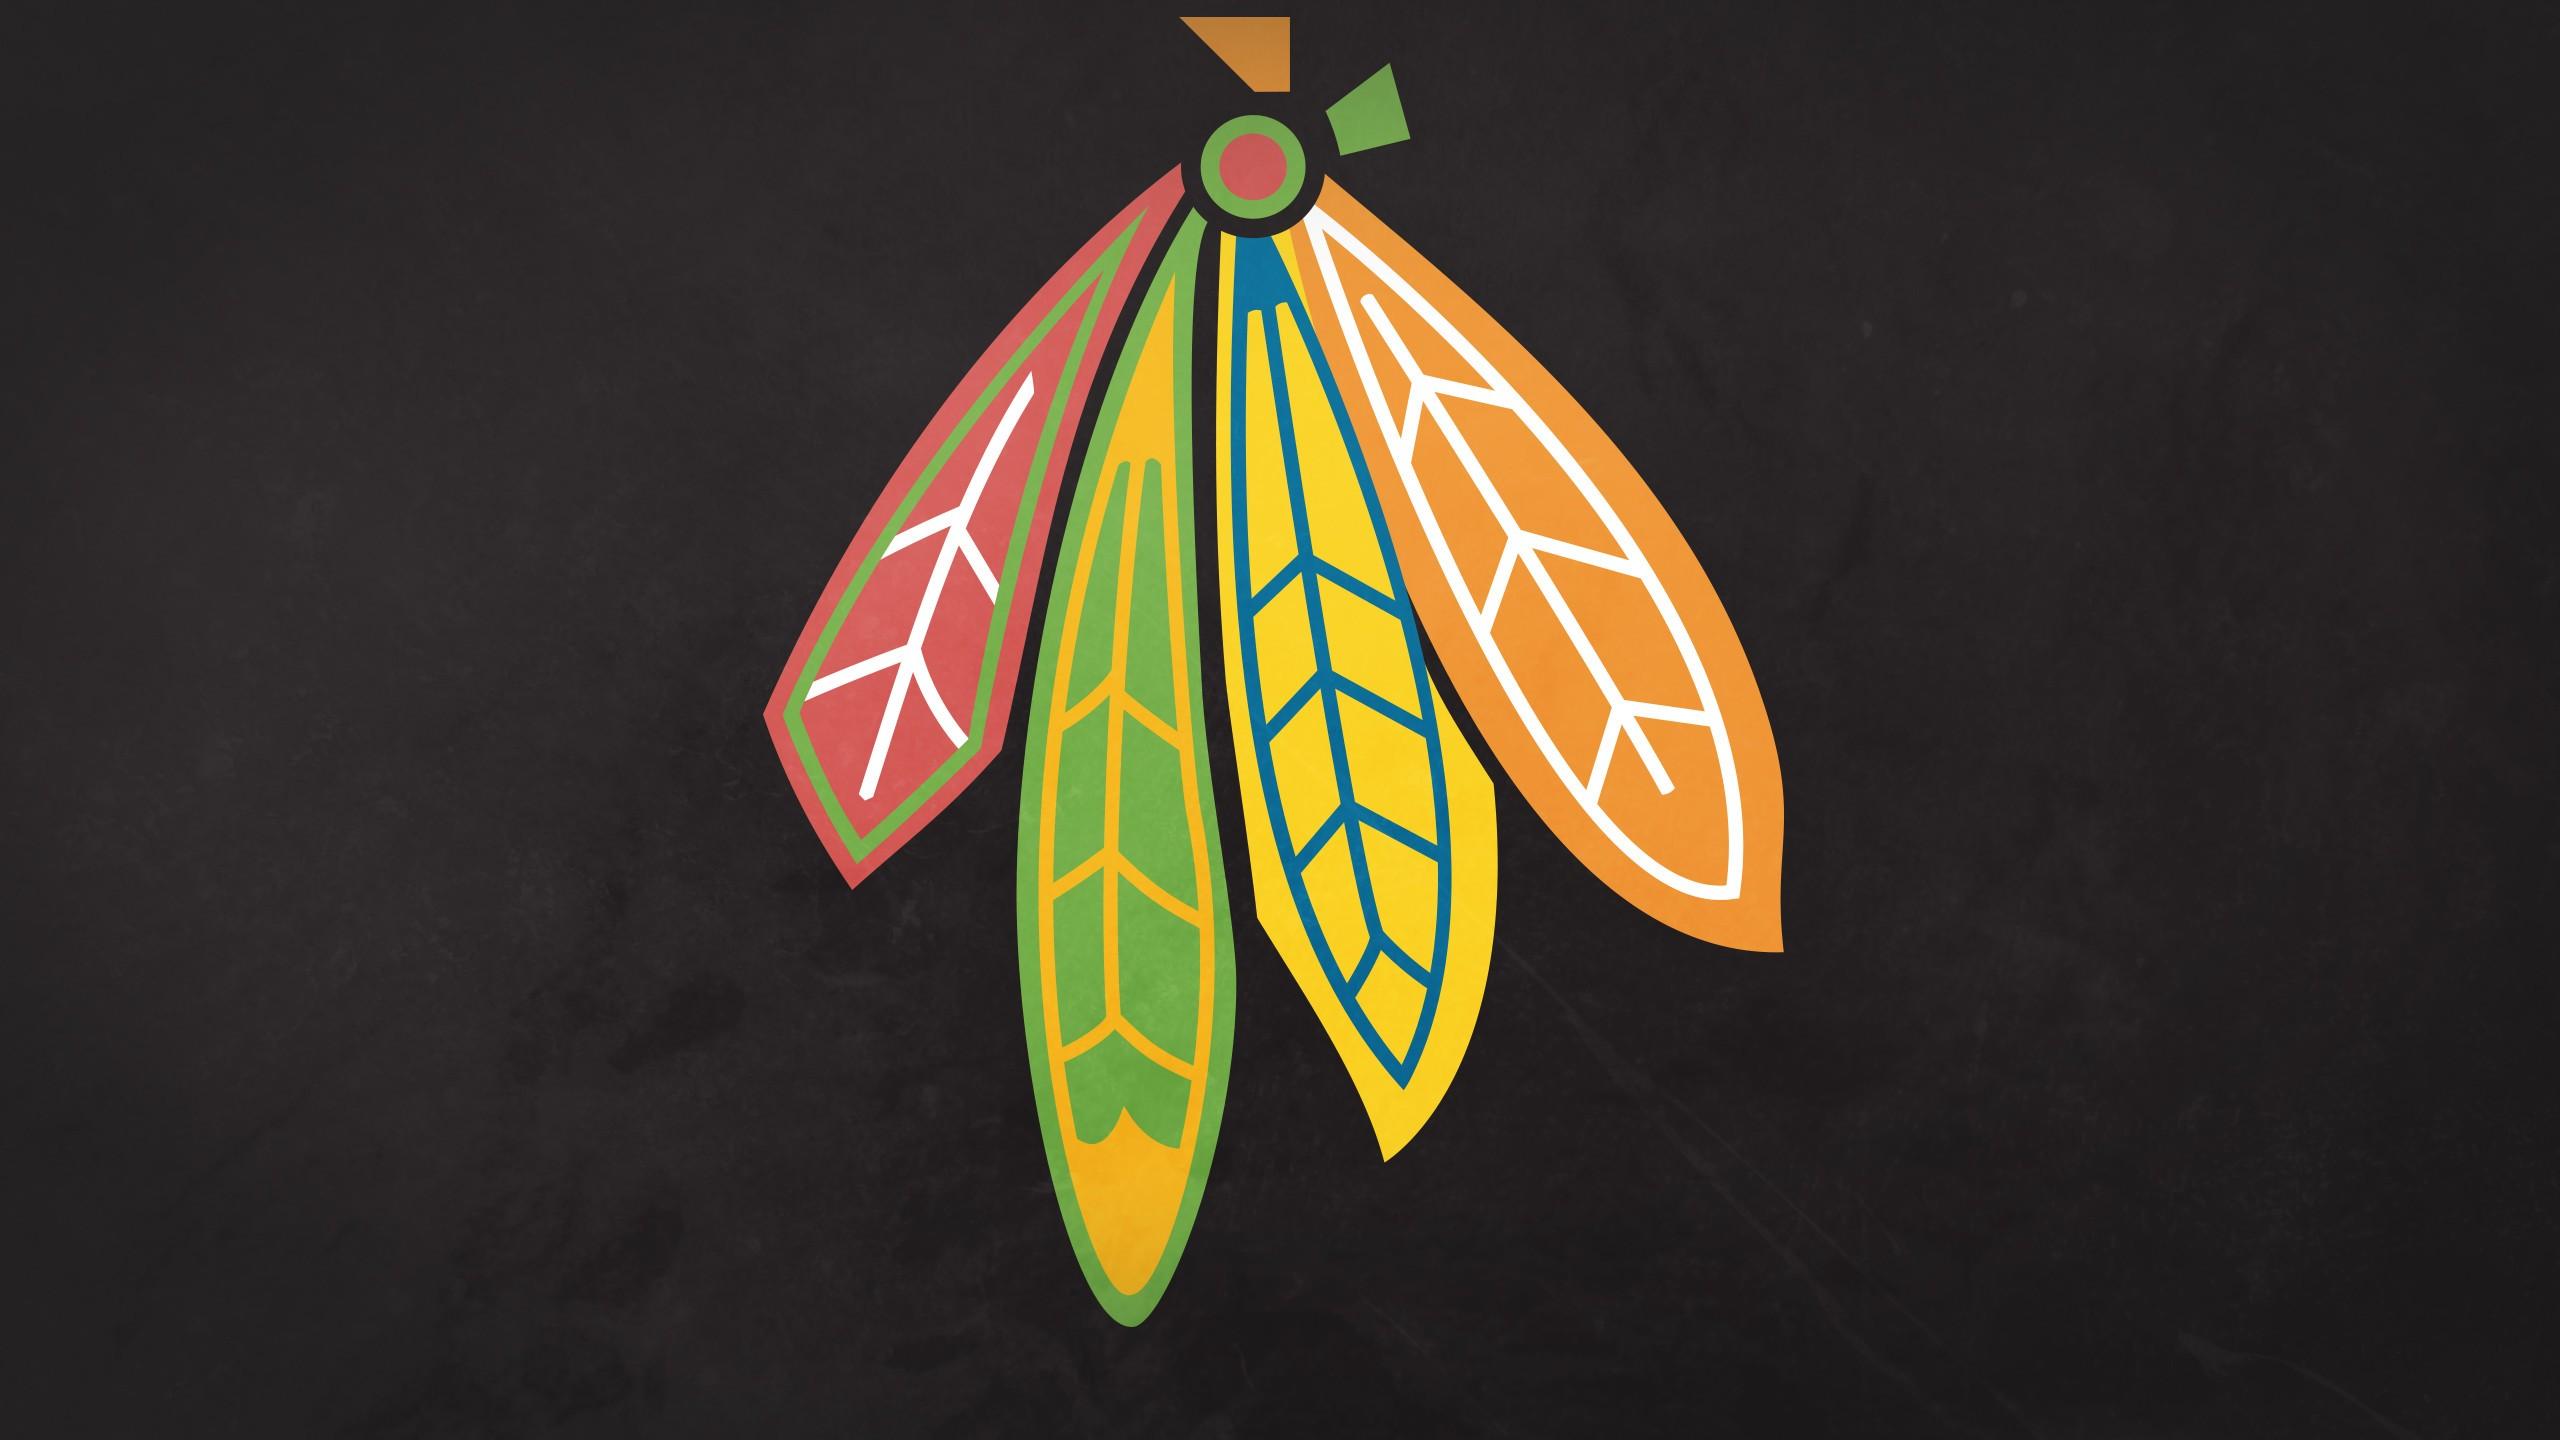 Chicago Blackhawks Full HD Wallpaper And Background Image